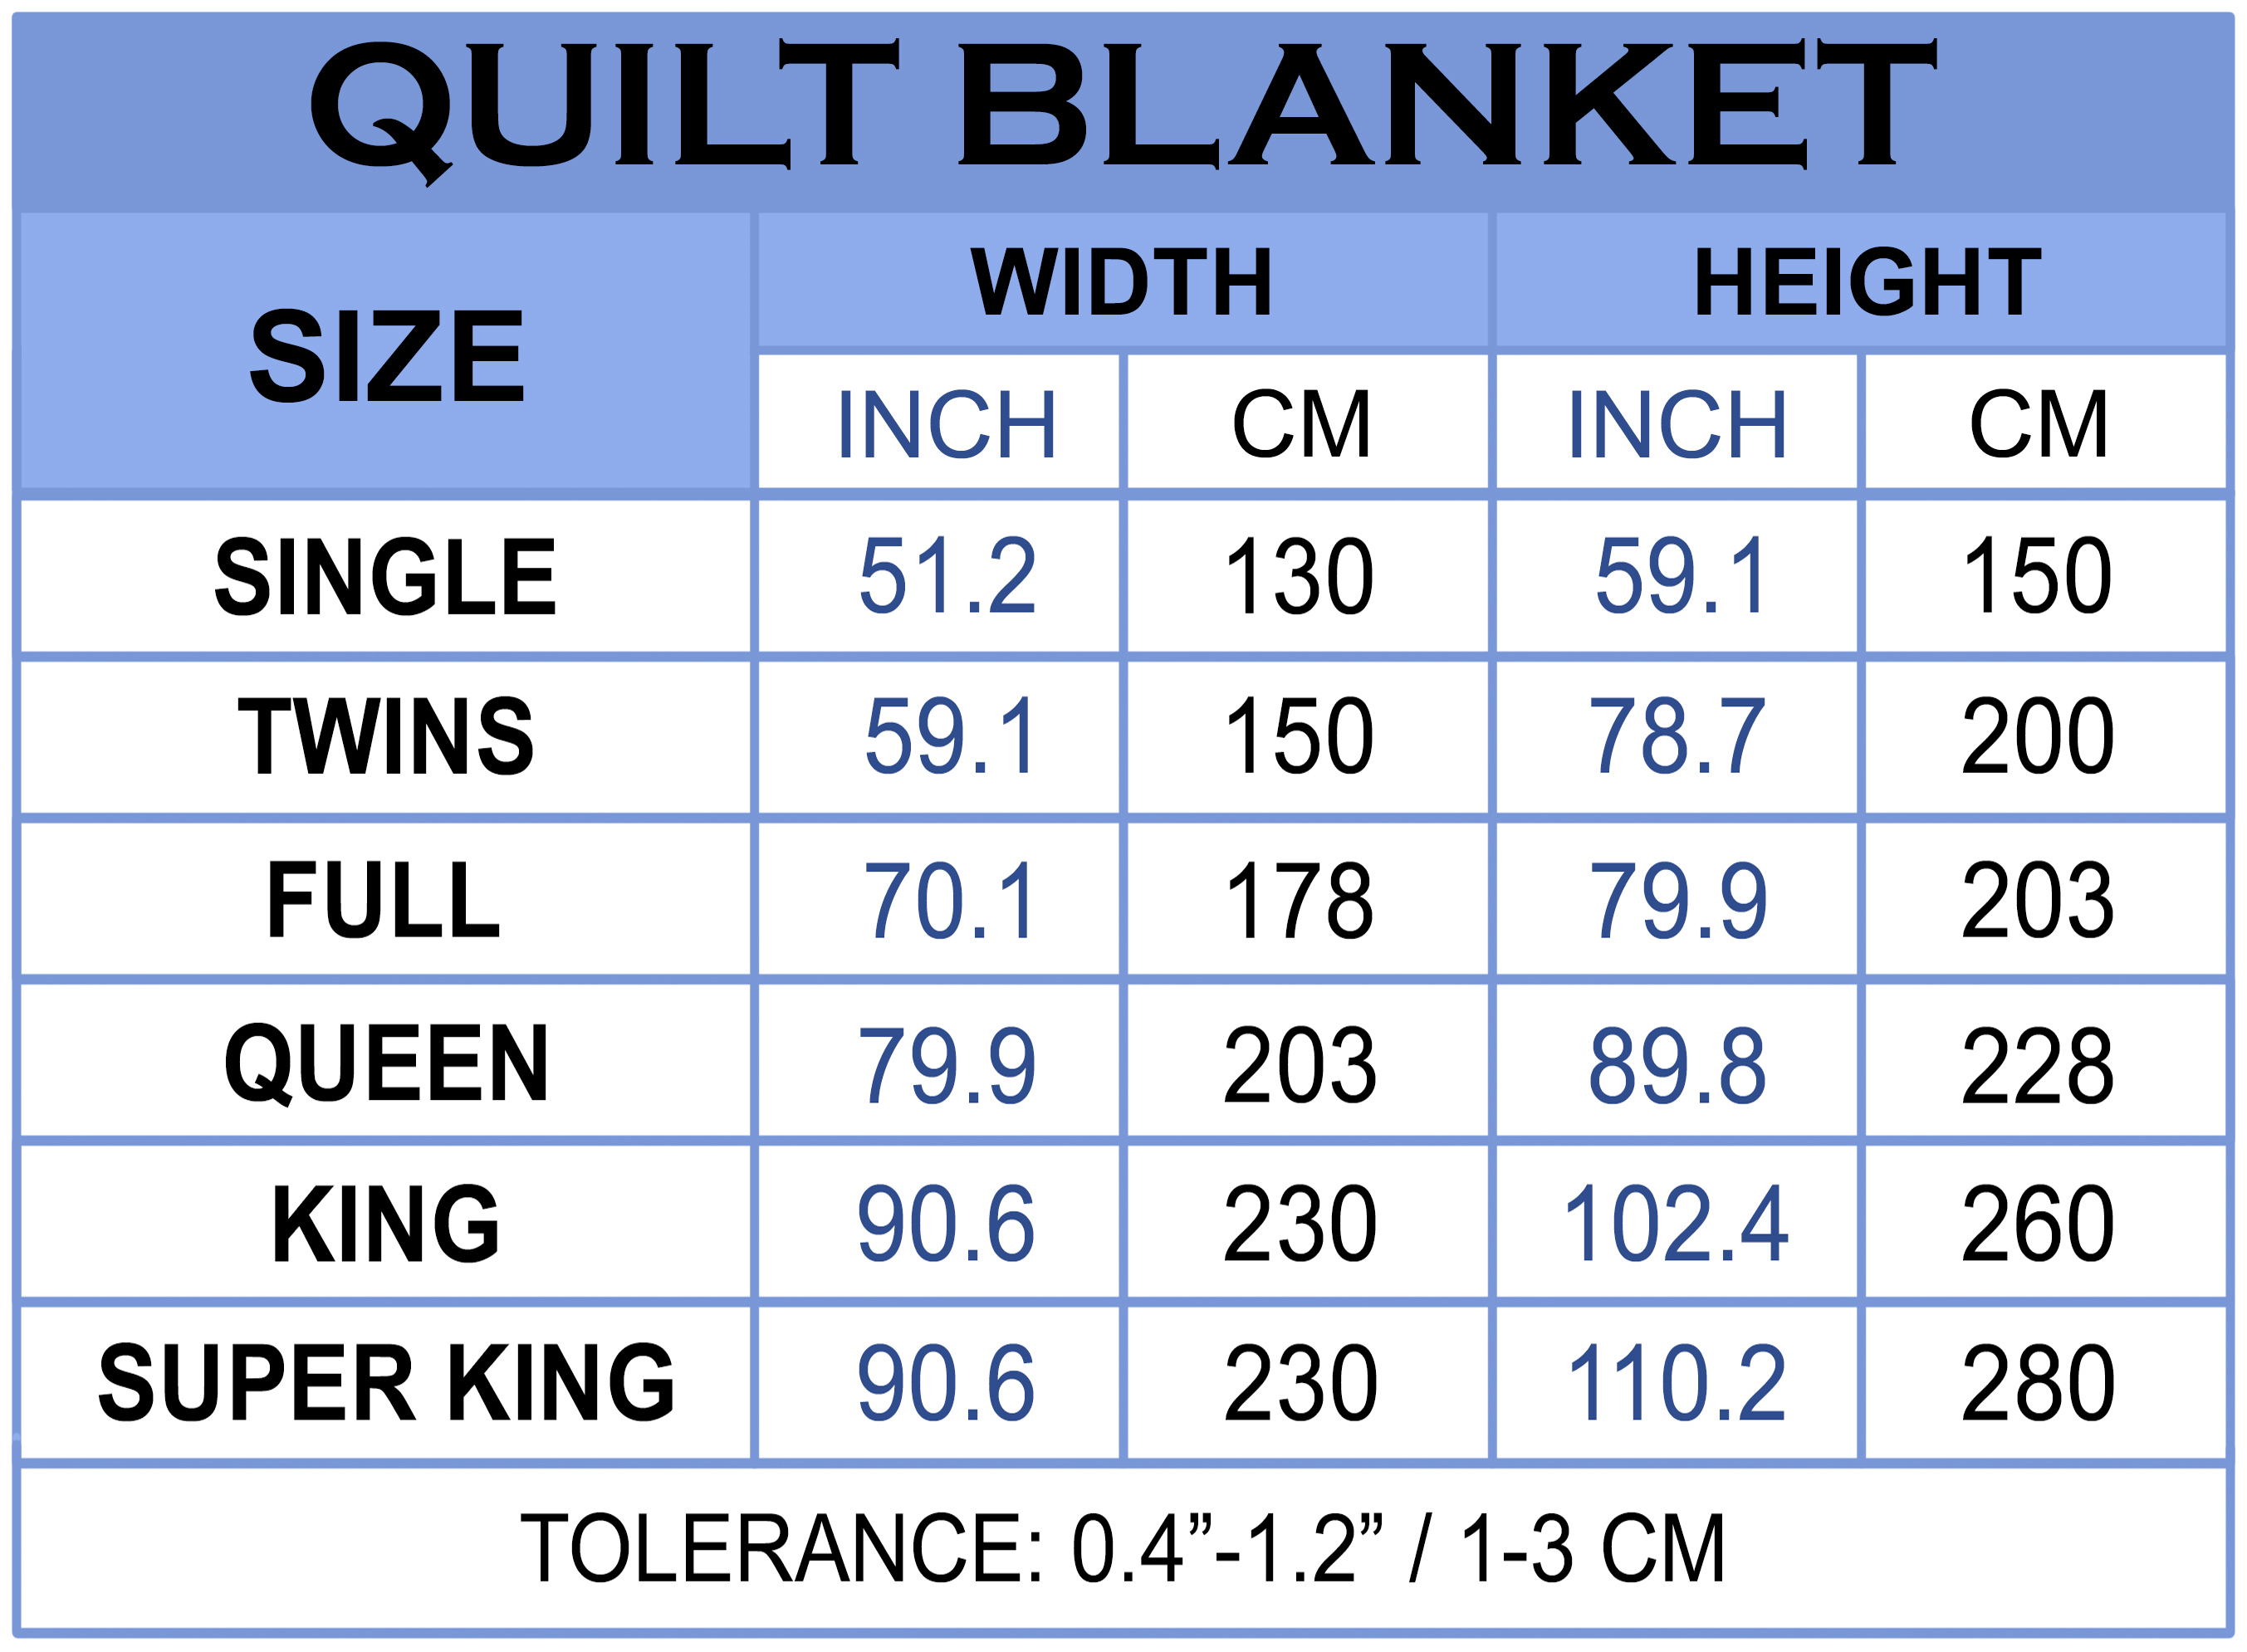 quilt-blanket-canawan.jpg